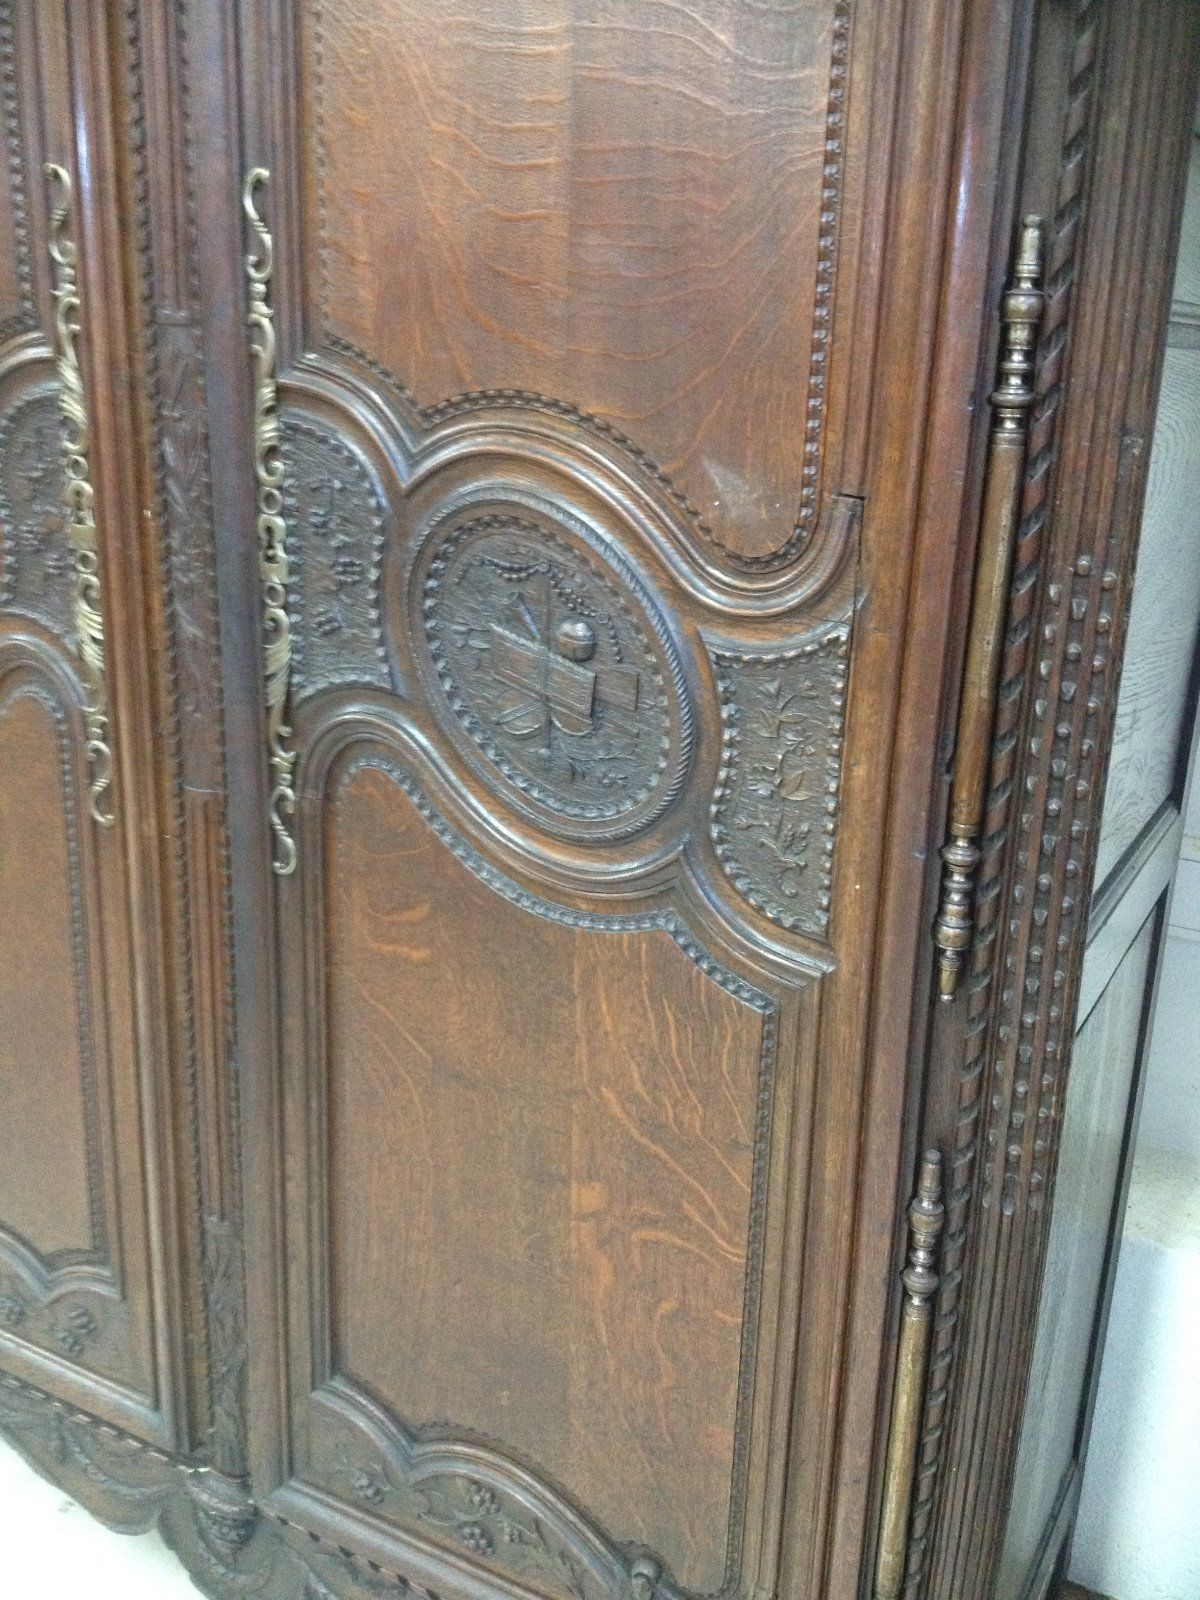 armoire normande 18Ème | ebay | armoire normande | pinterest